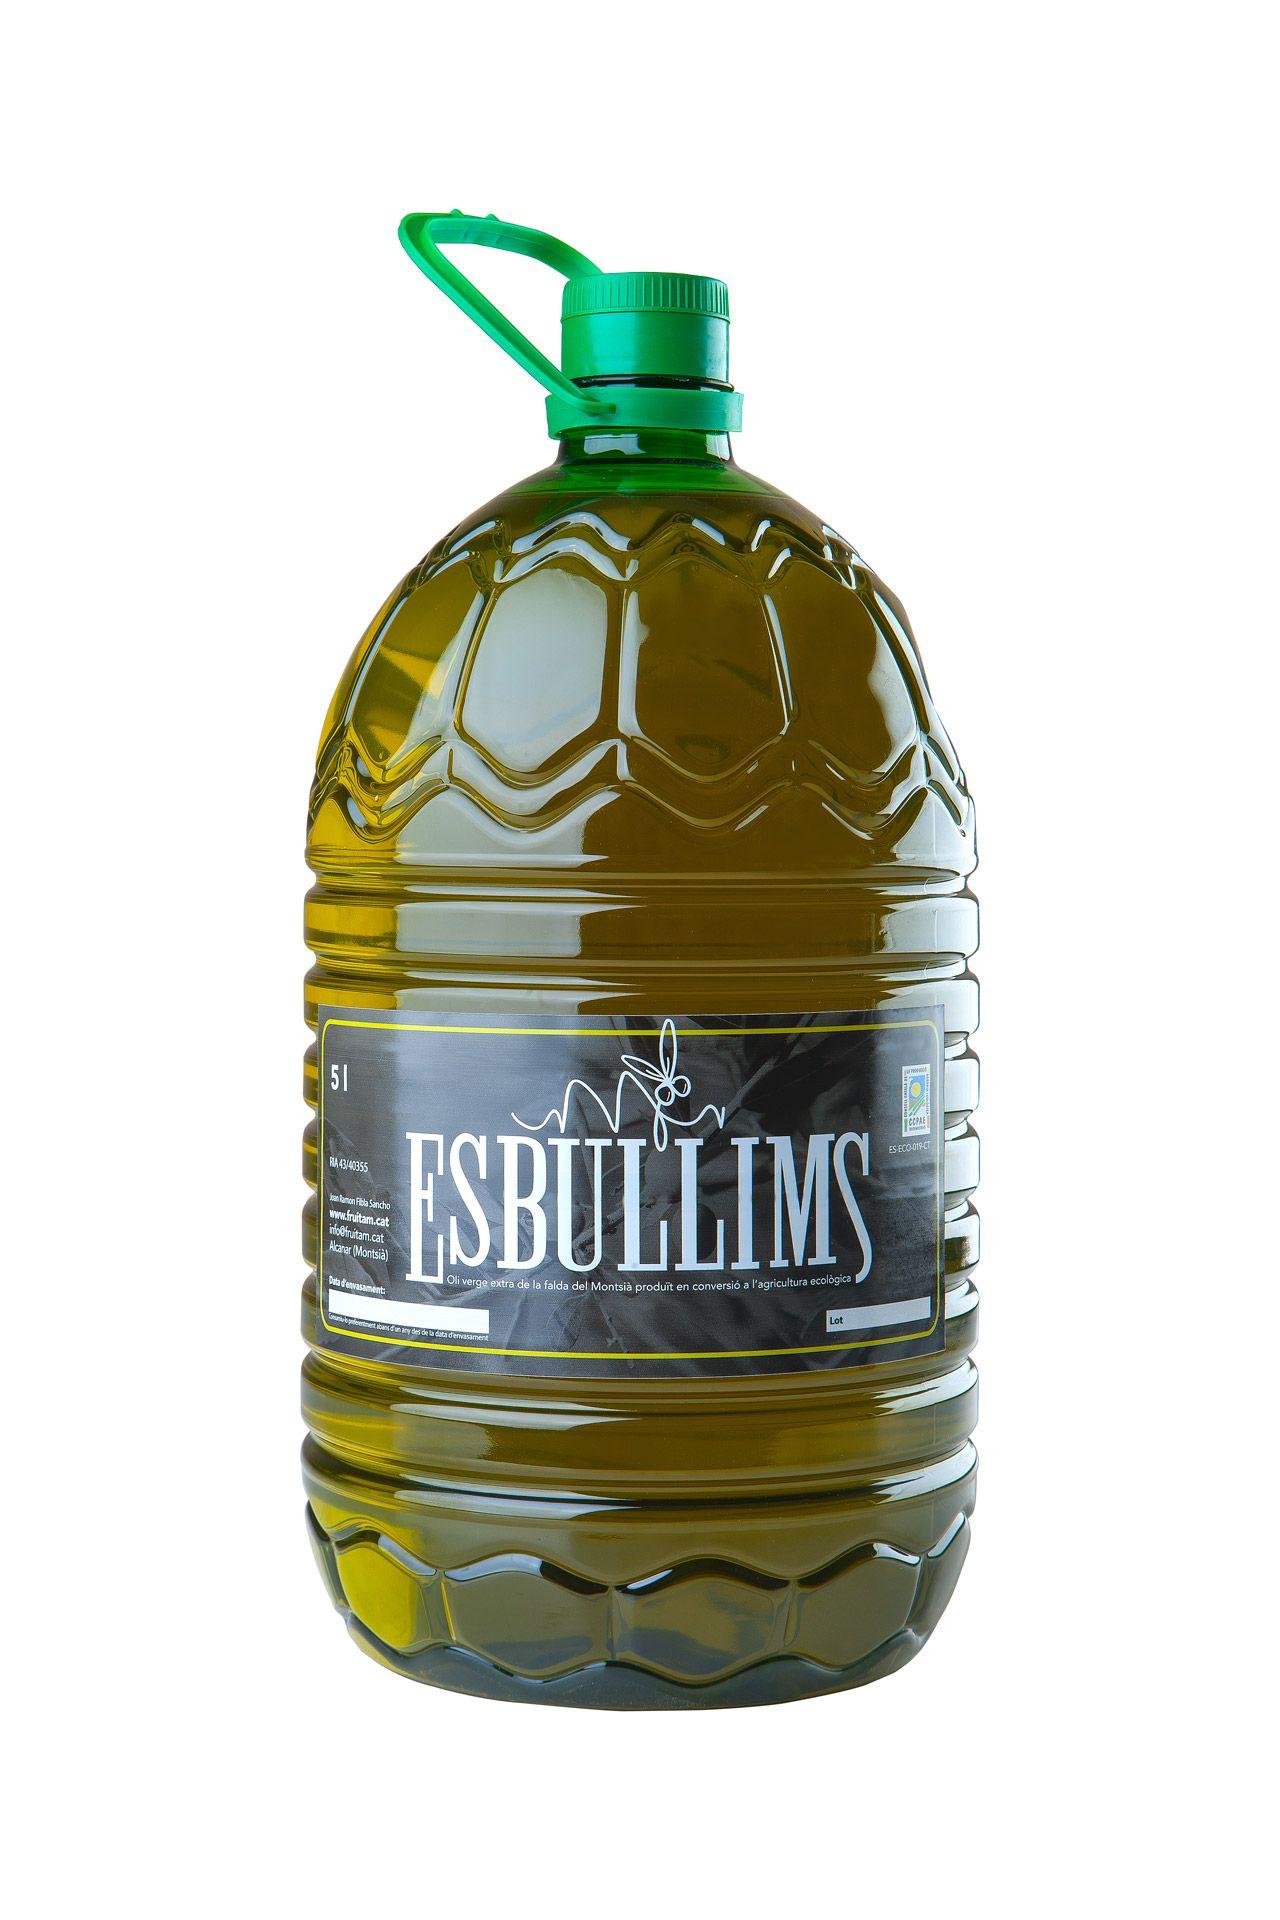 ESBULLIMS 5 litres